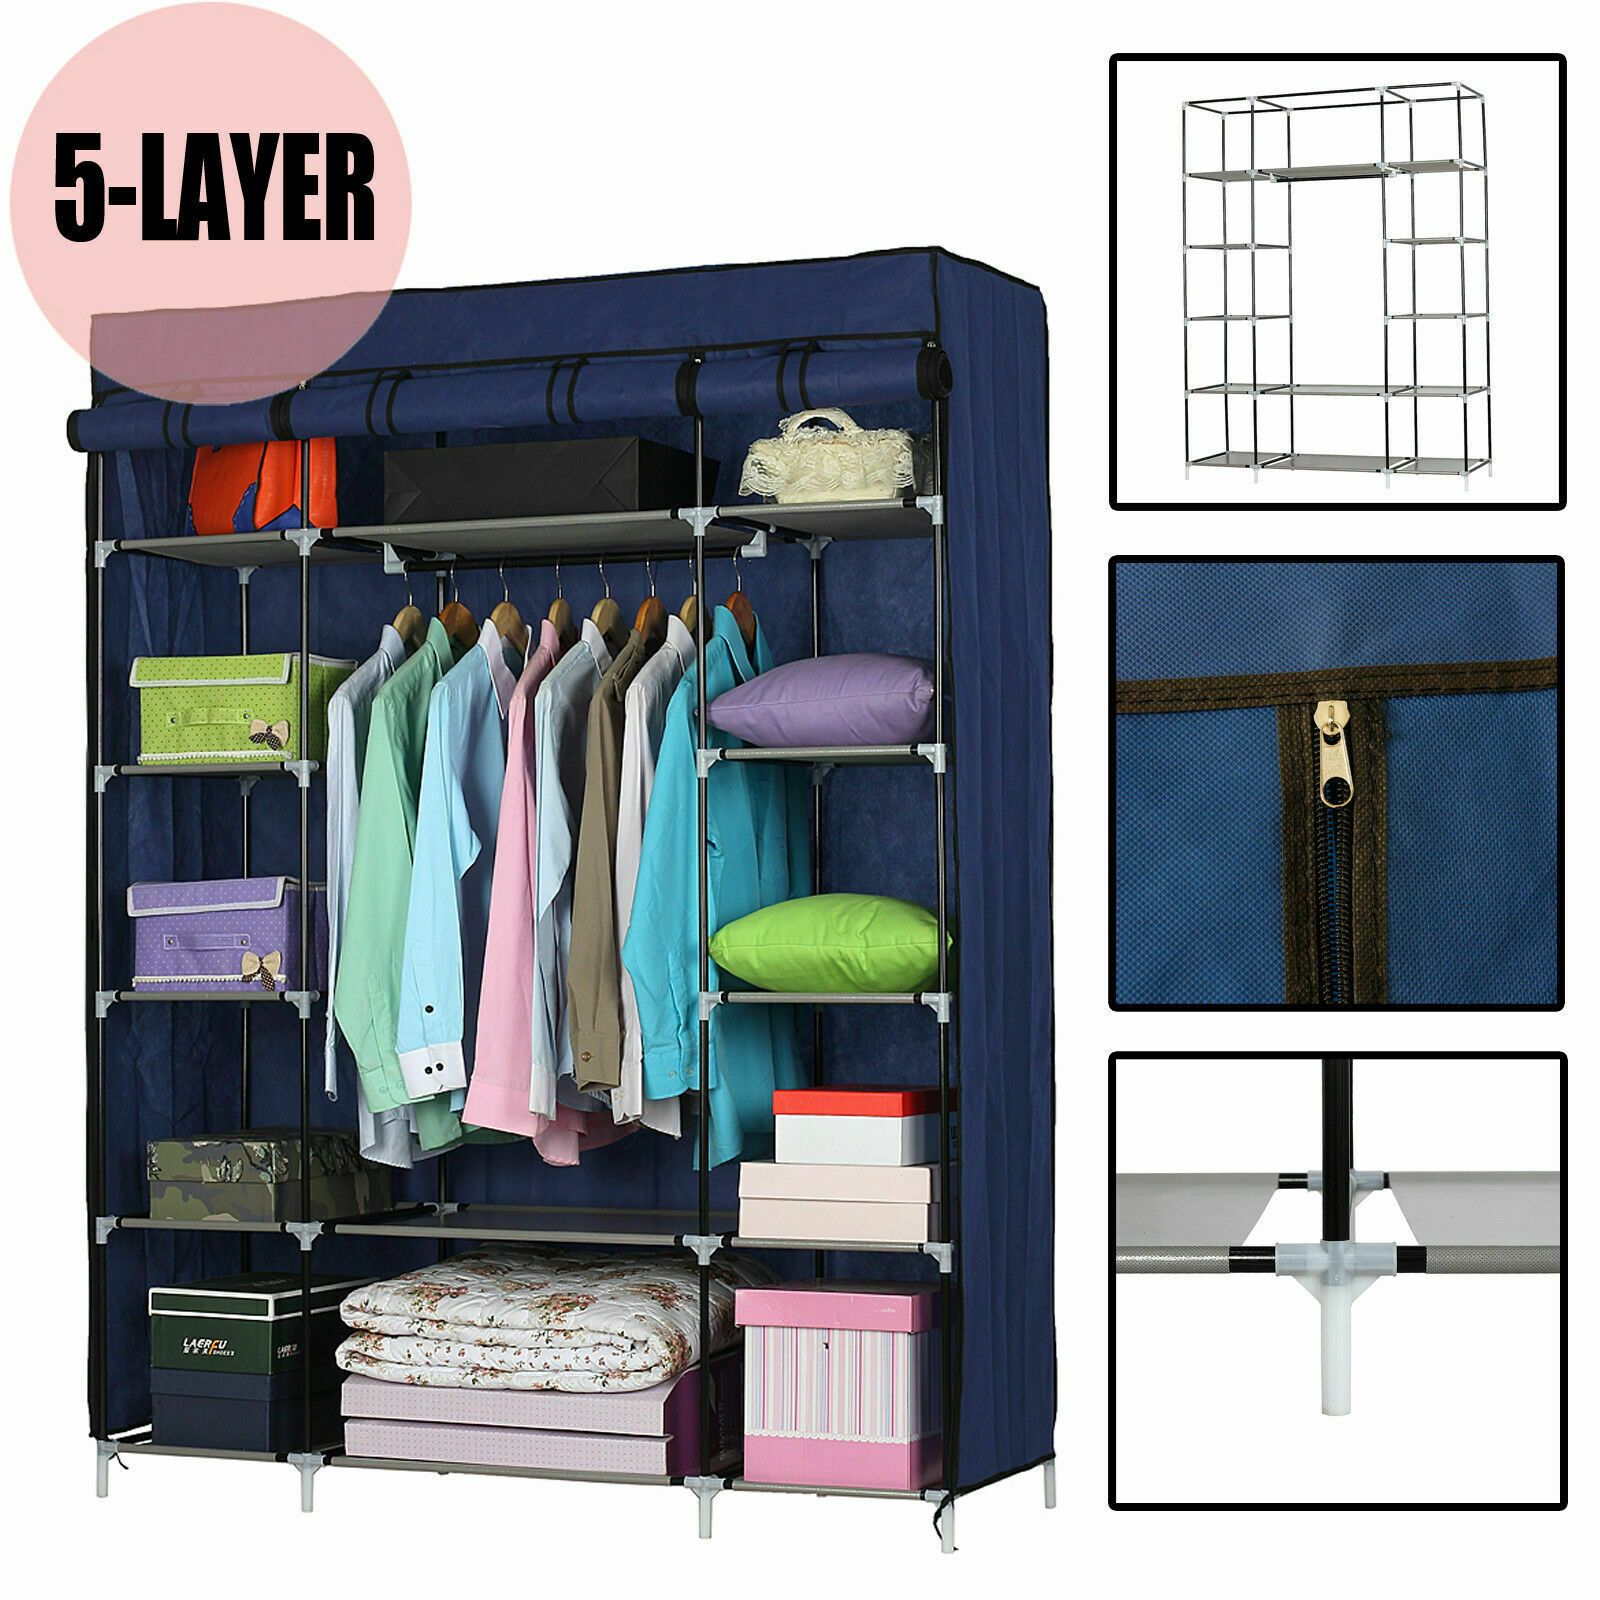 Details About Portable Heavy Duty Closet Storage Organizer Clothes